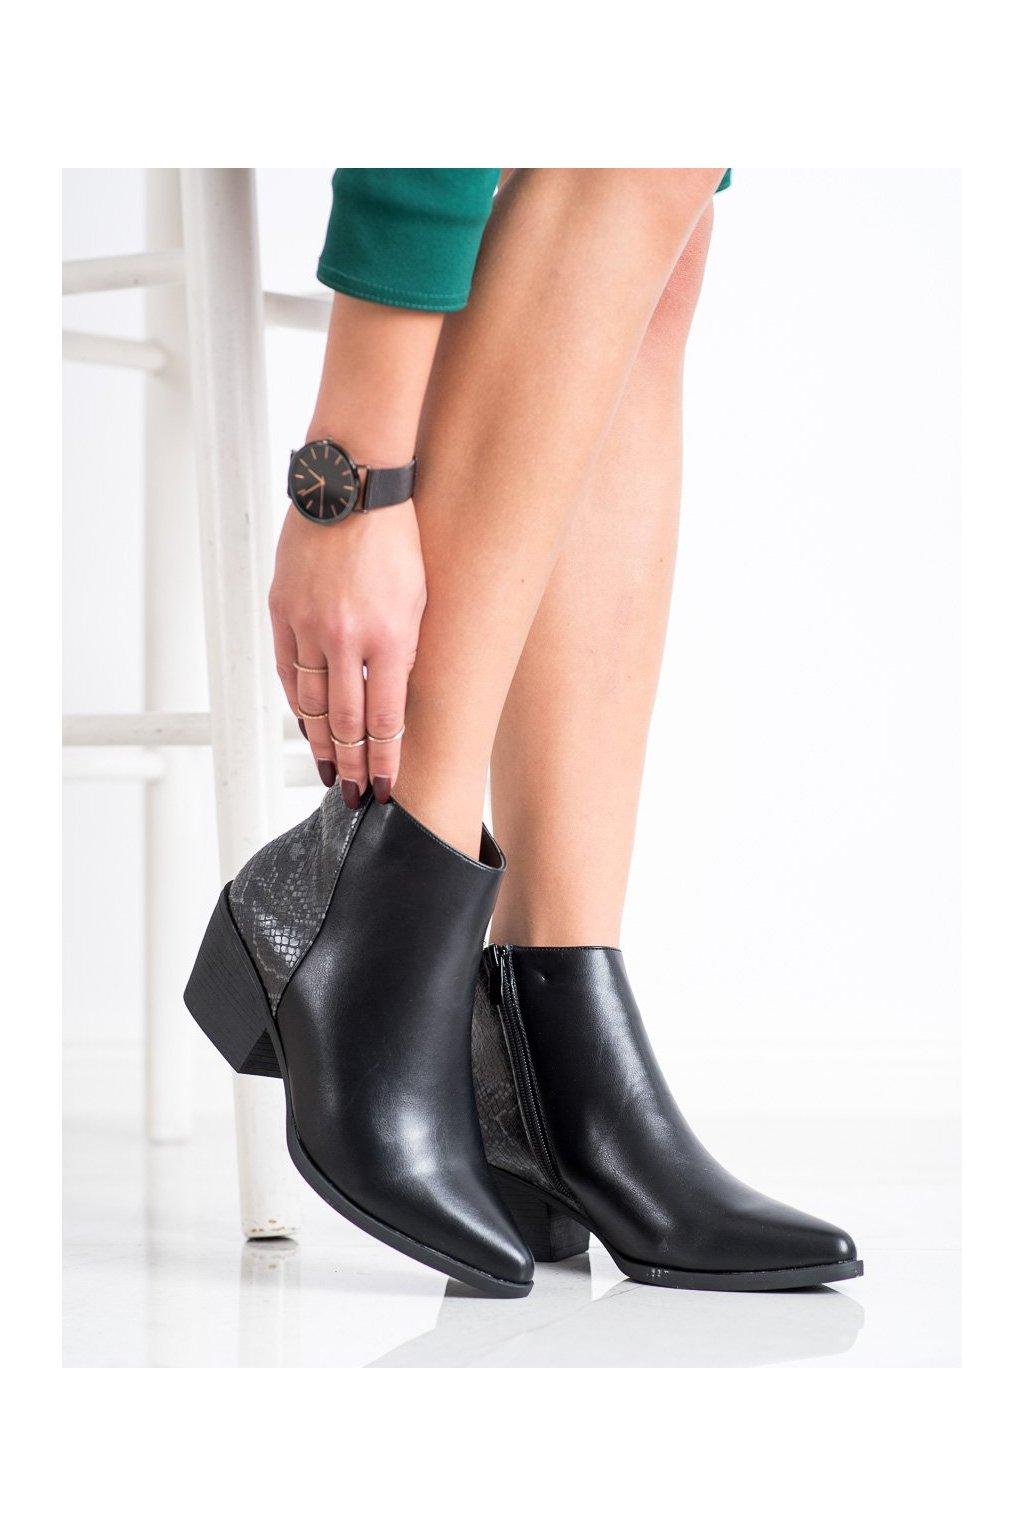 Čierne dámske topánky Cm paris kod 688-A19B